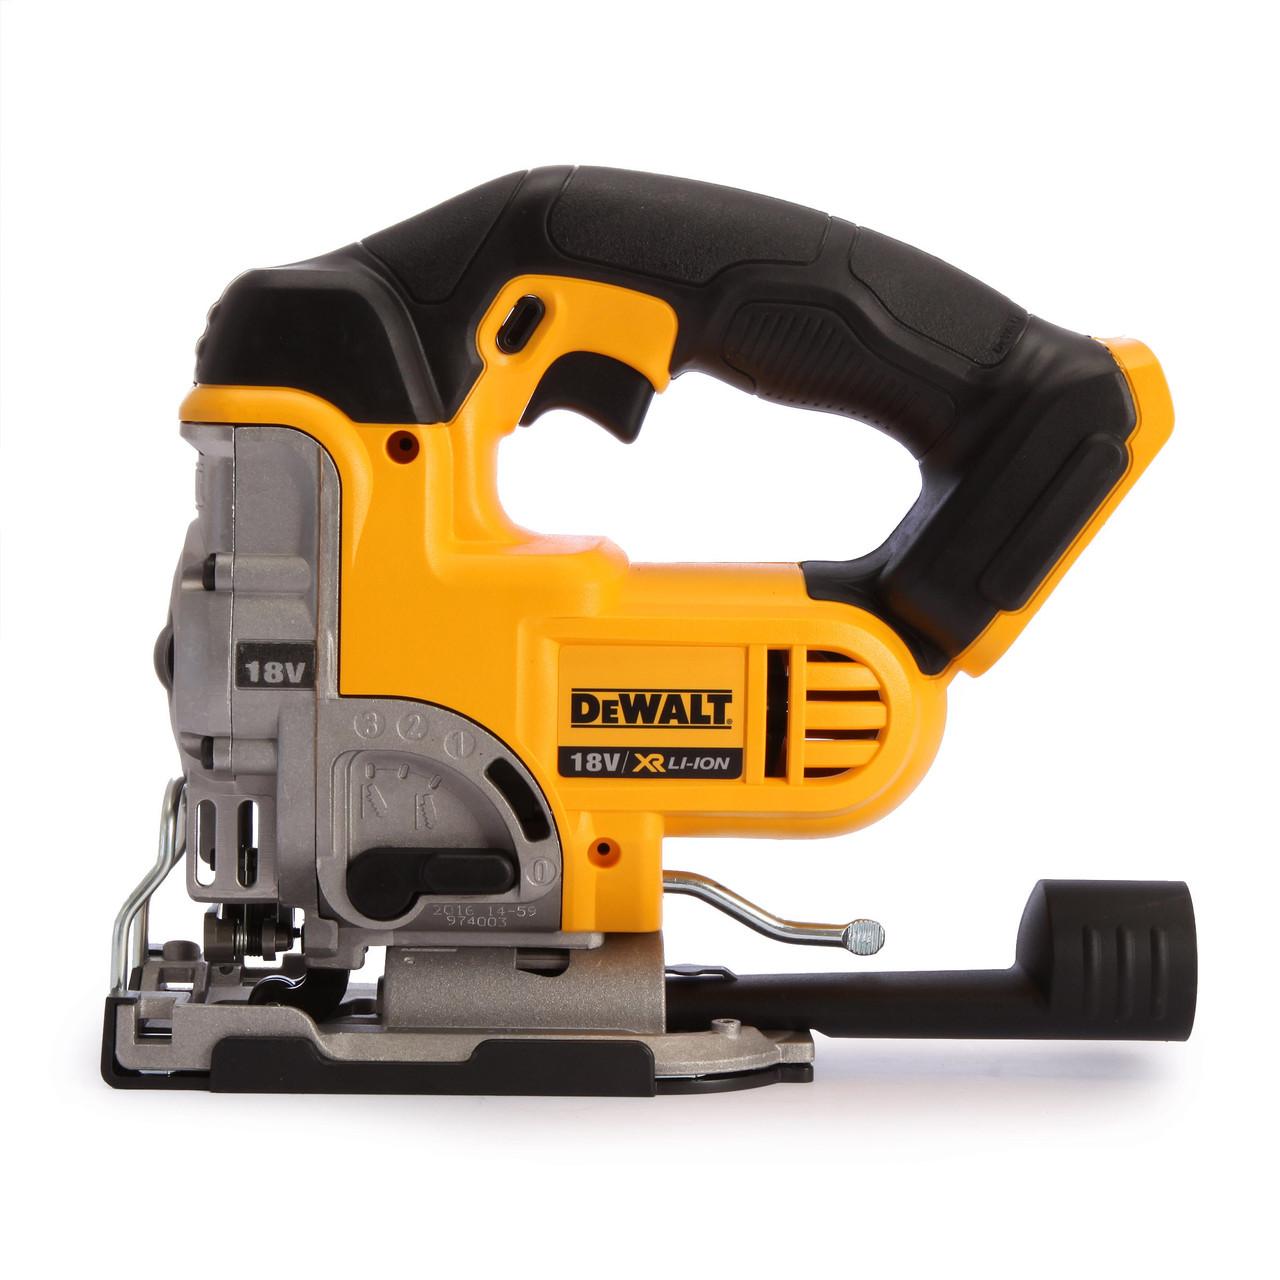 DEWALT DCS331 18V CORDLESS JIGSAW BODY ONLY | Tool